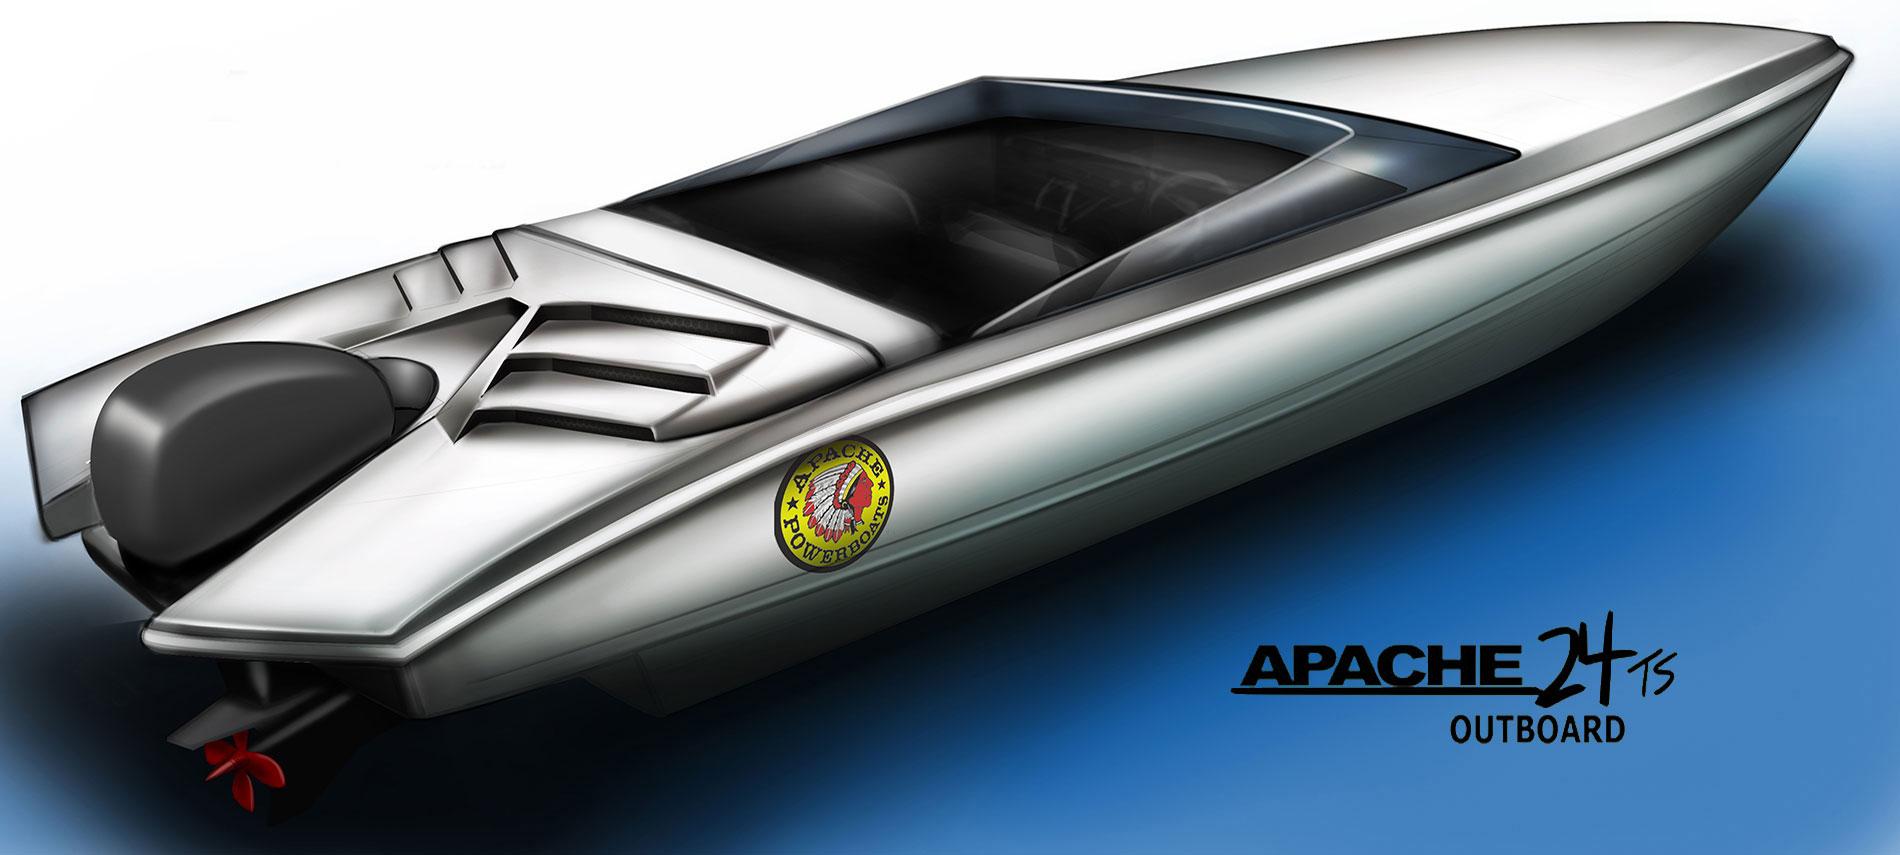 apache-24-outboard